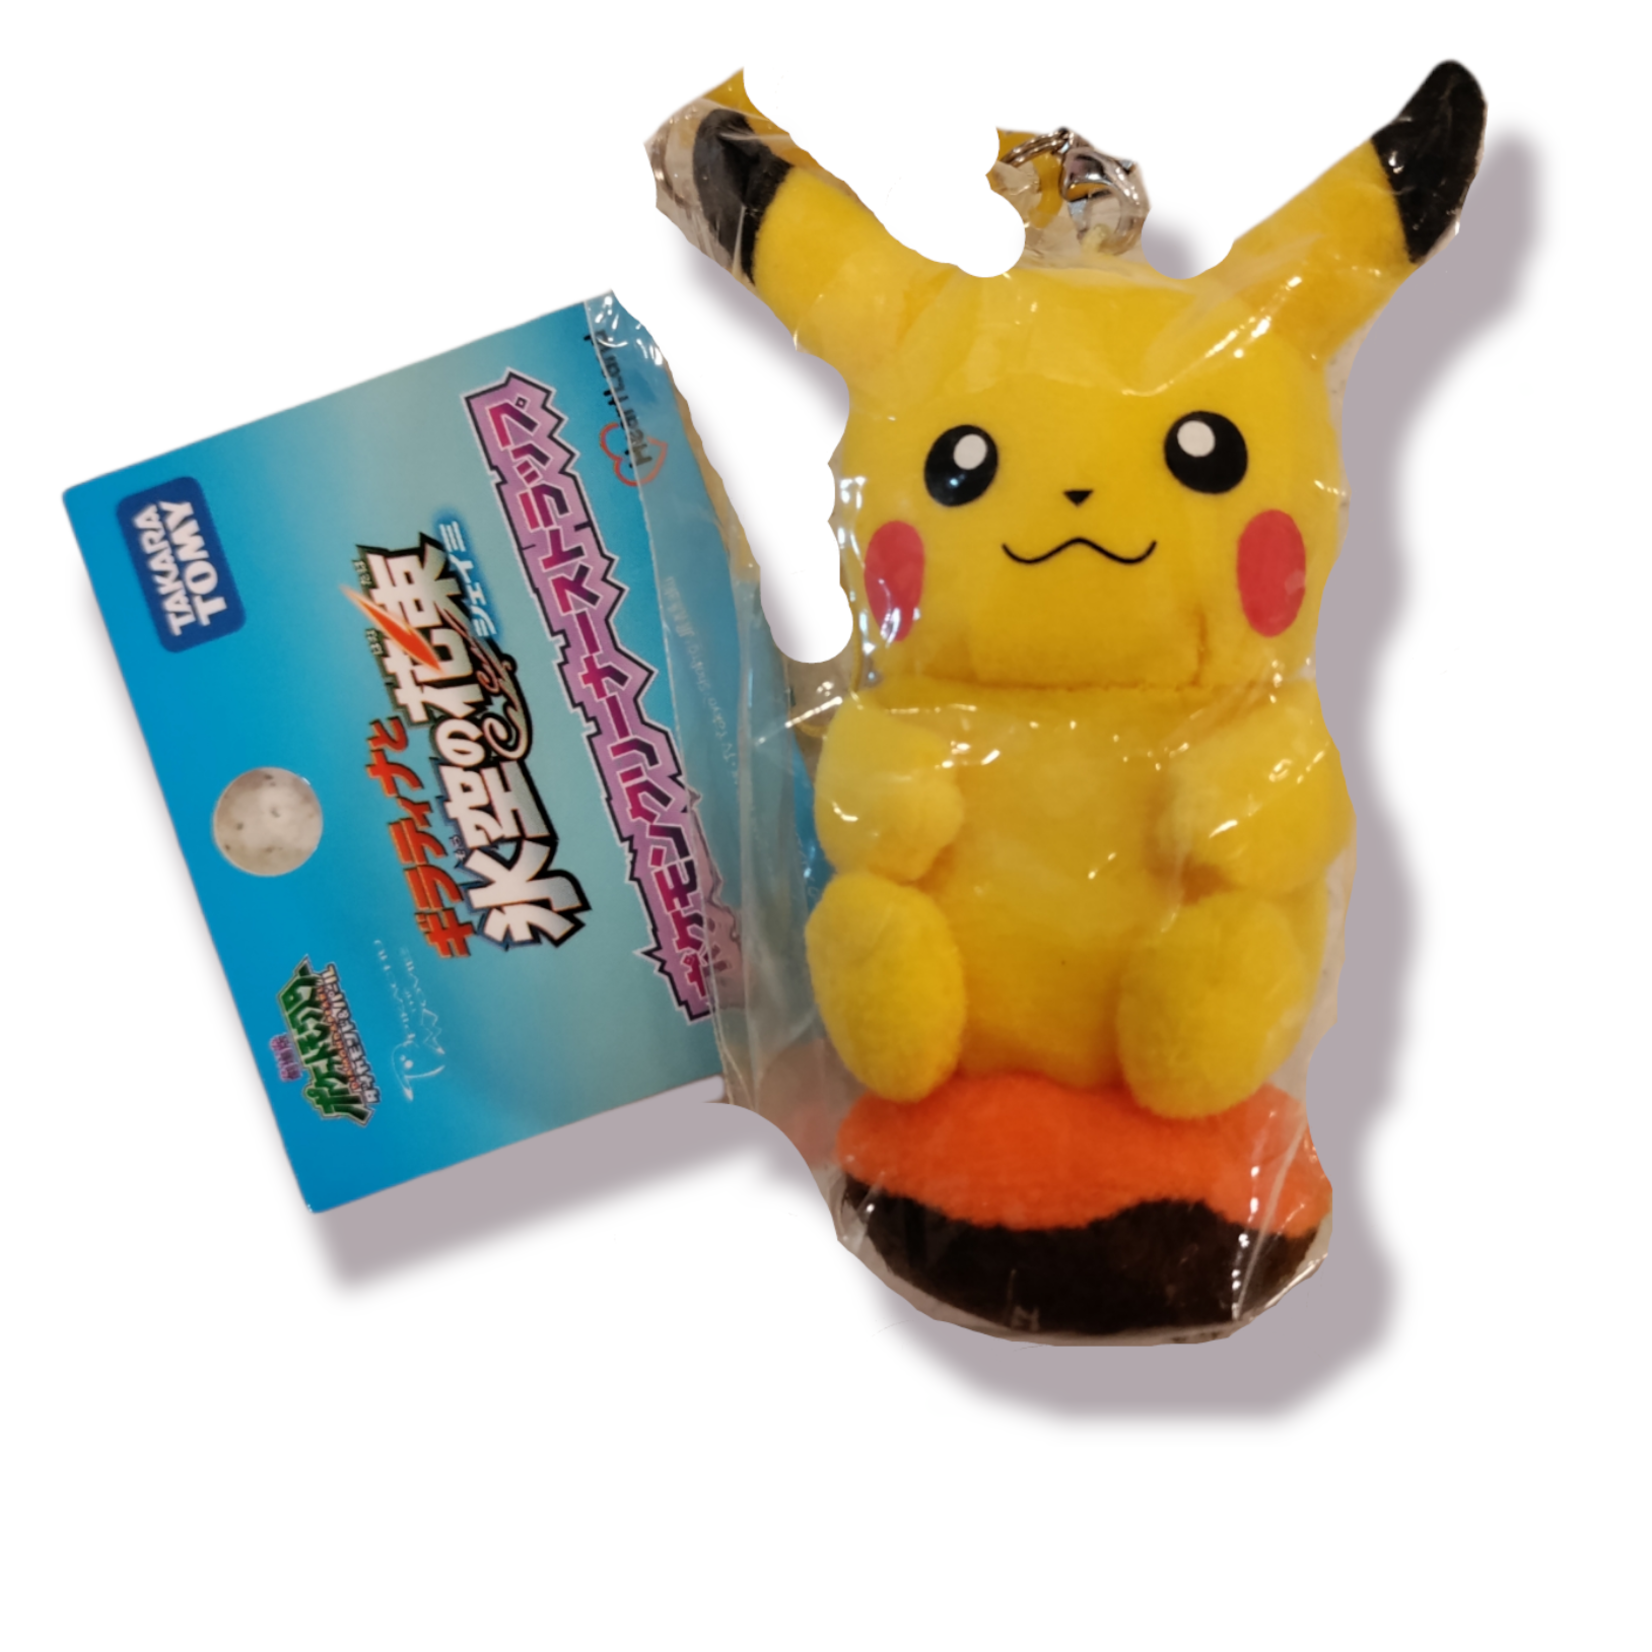 Takara Tomy Porte clé Pikachu coussin